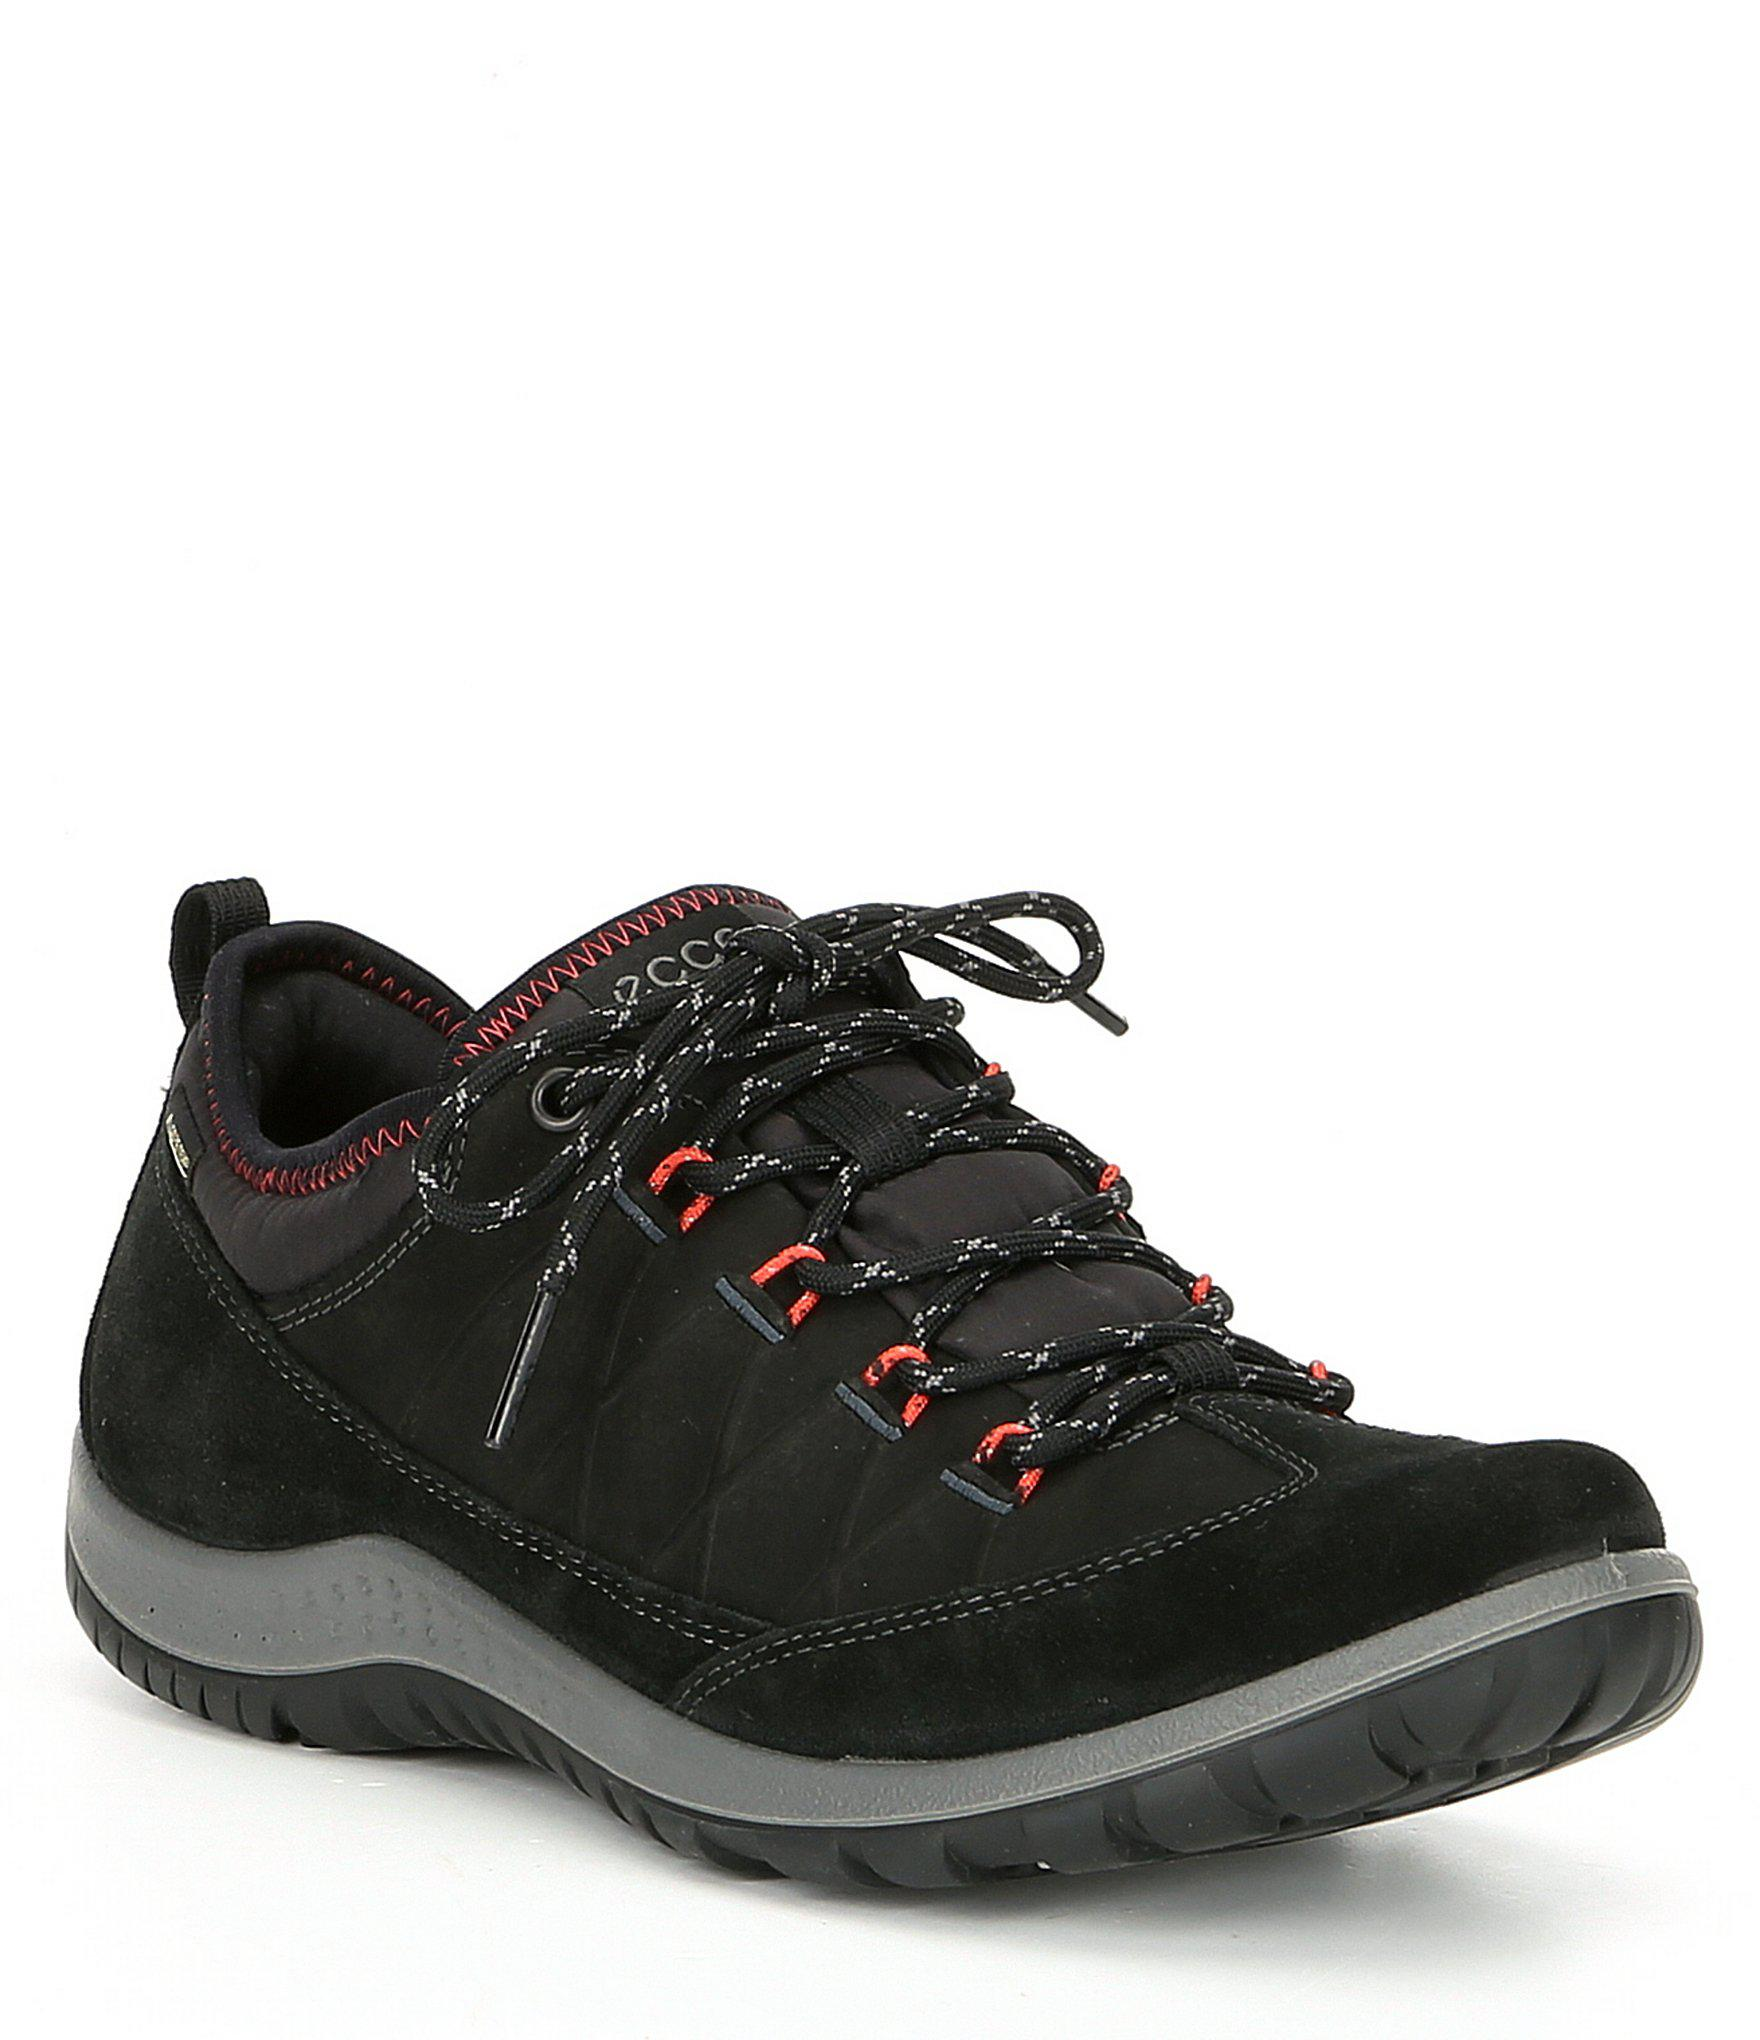 Ecco Black Gtx Waterproof Lyst In Aspina Low Sneakers Women's 7gfYb6yv